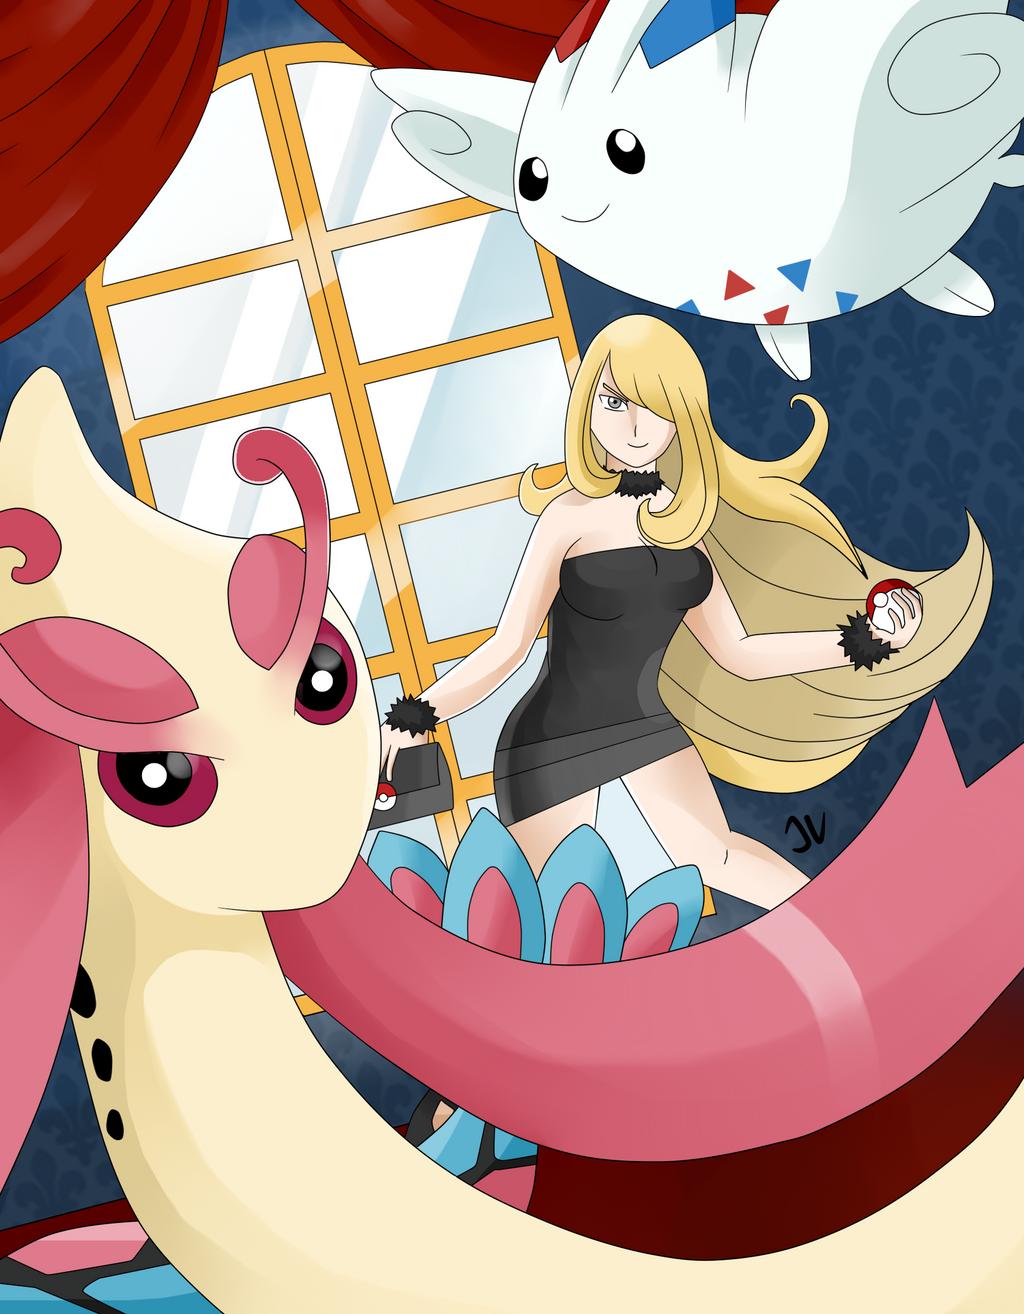 Cynthia Pokemon Ice Cream Images | Pokemon Images